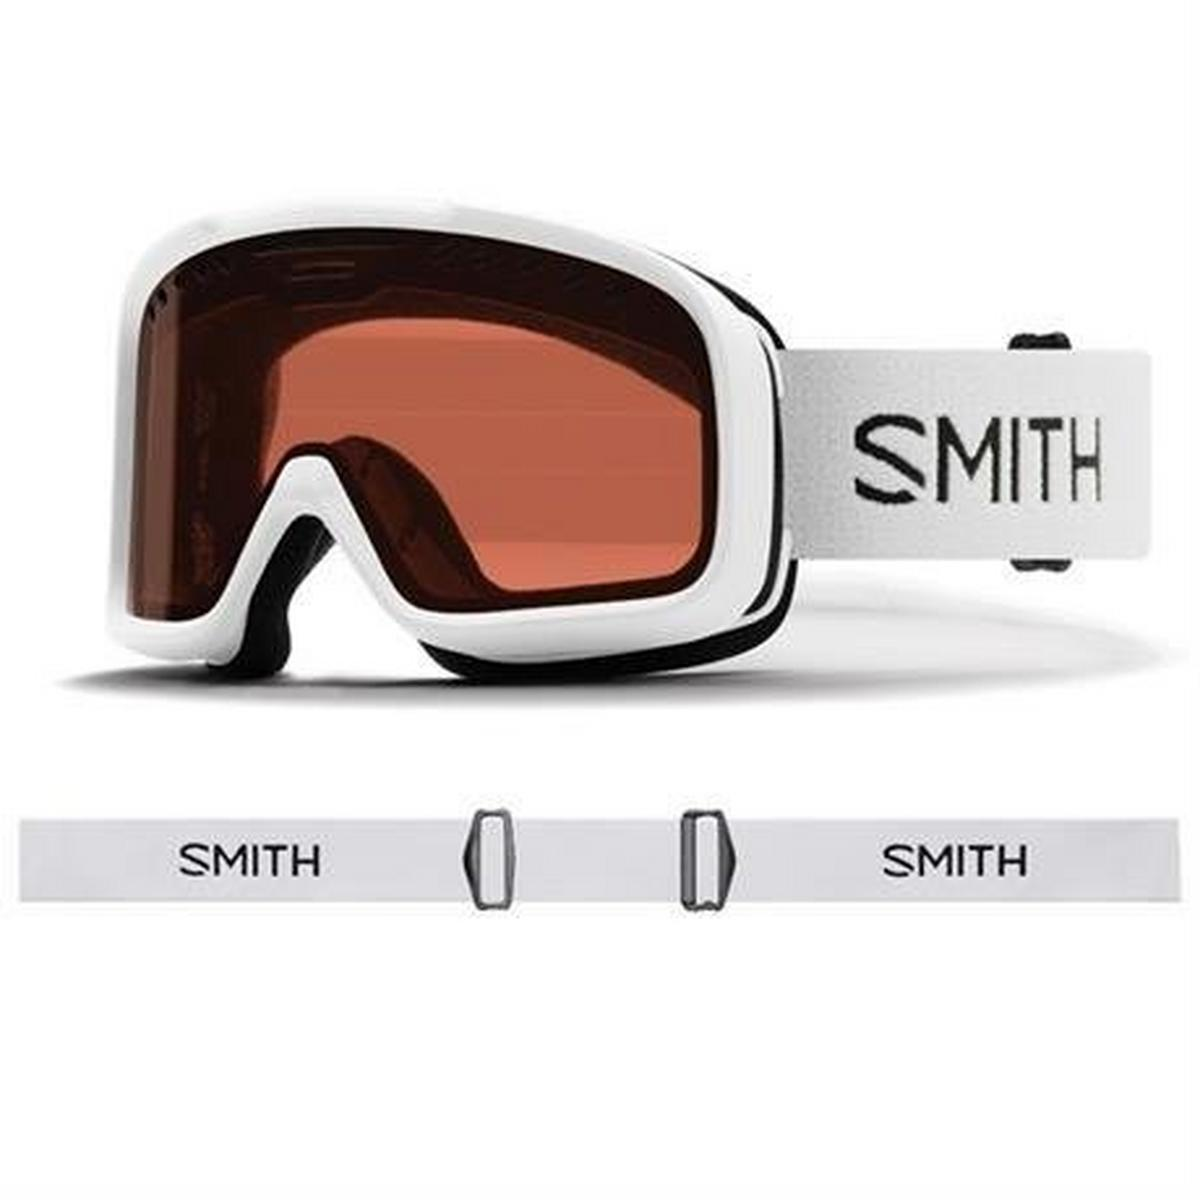 Smith Optics Smith Ski Goggles Project White RC36 Lens Cat 2